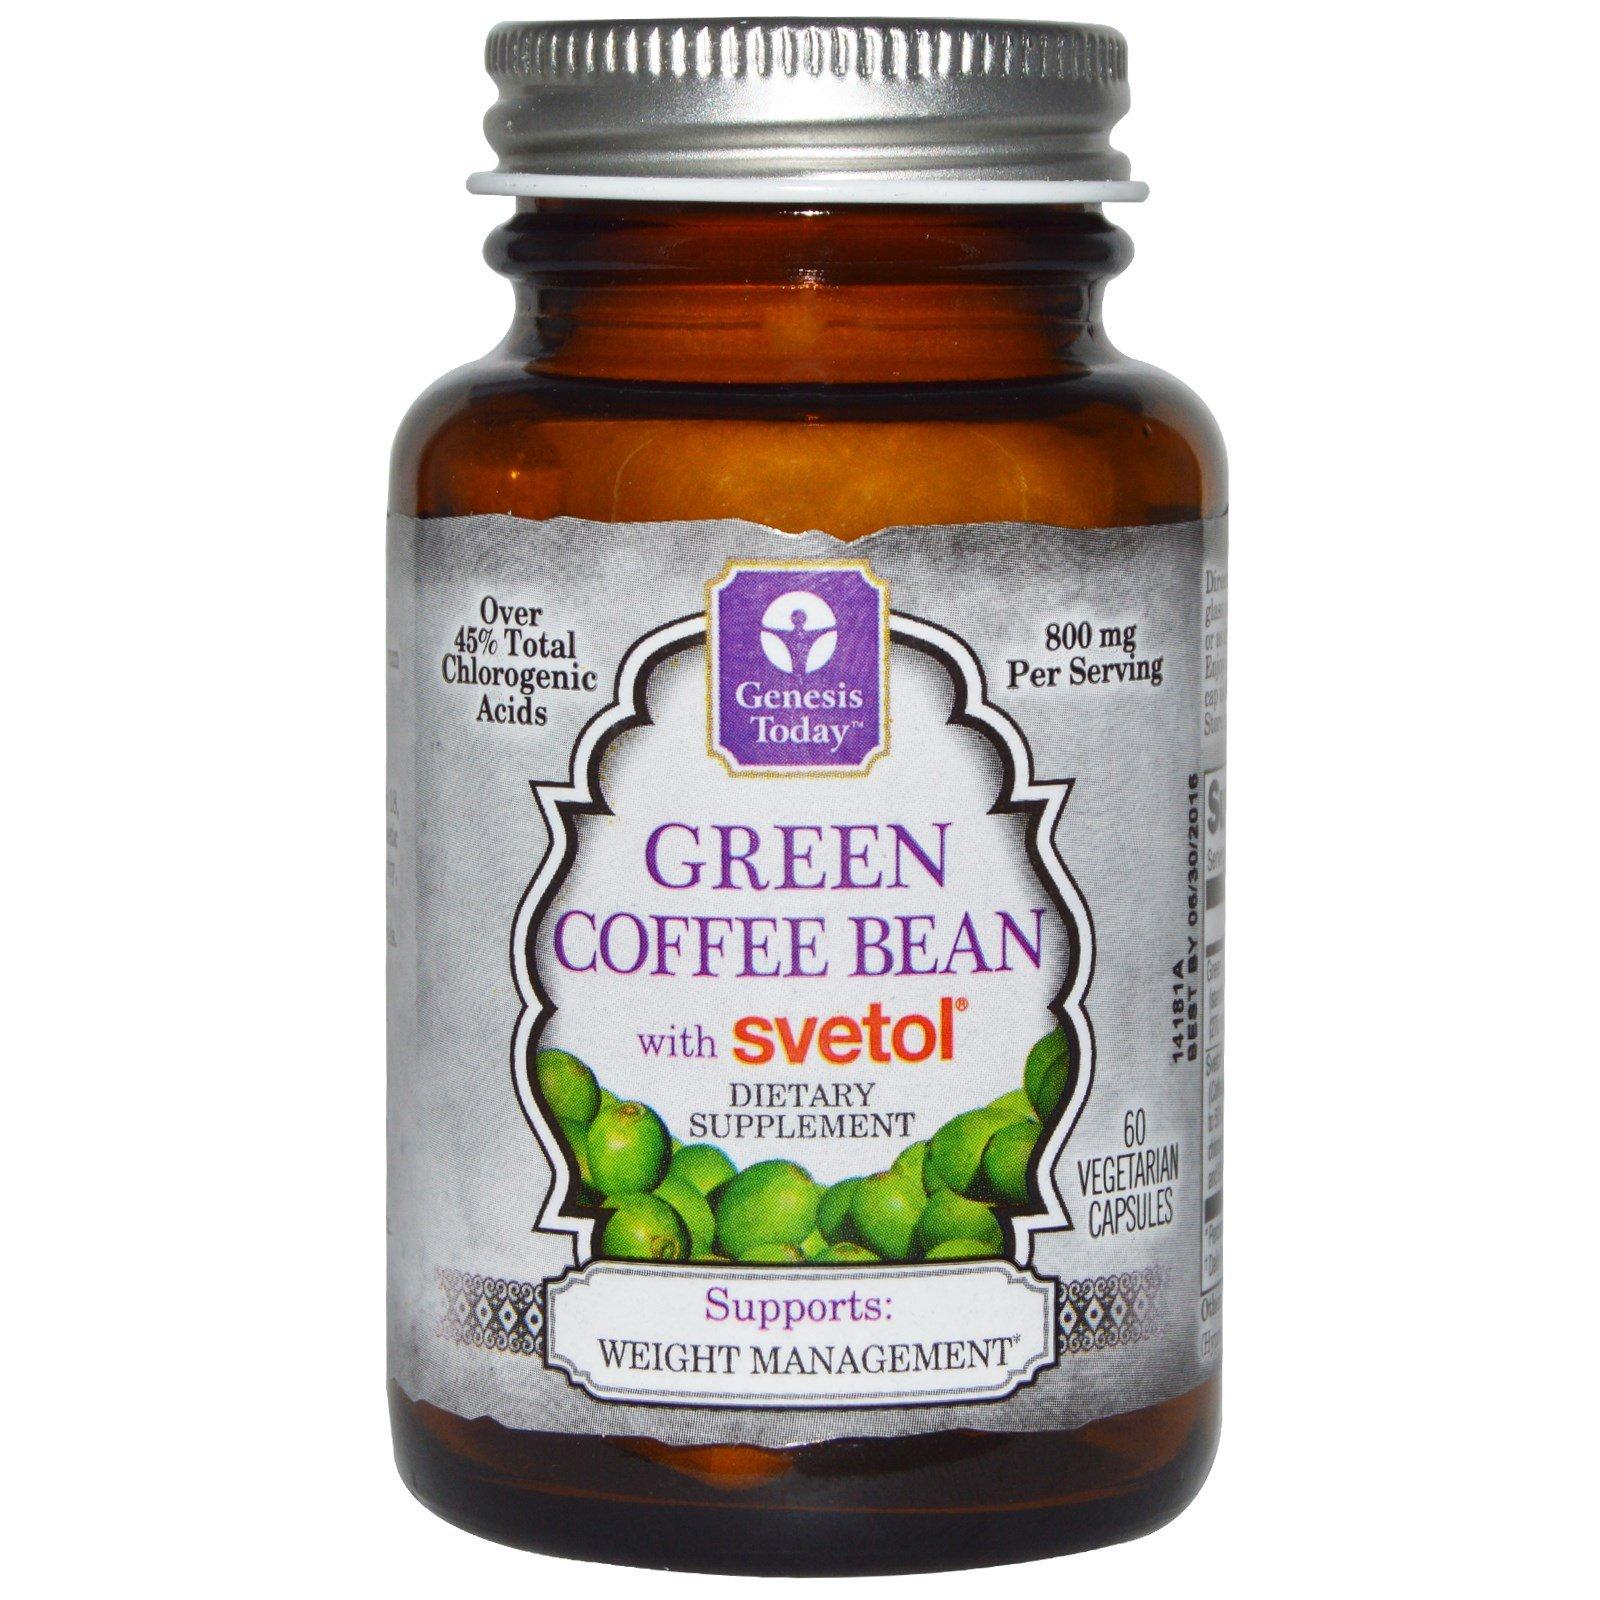 Genesis Today, Green Coffee Bean with Svetol, 60 Veggie Caps - 3PC